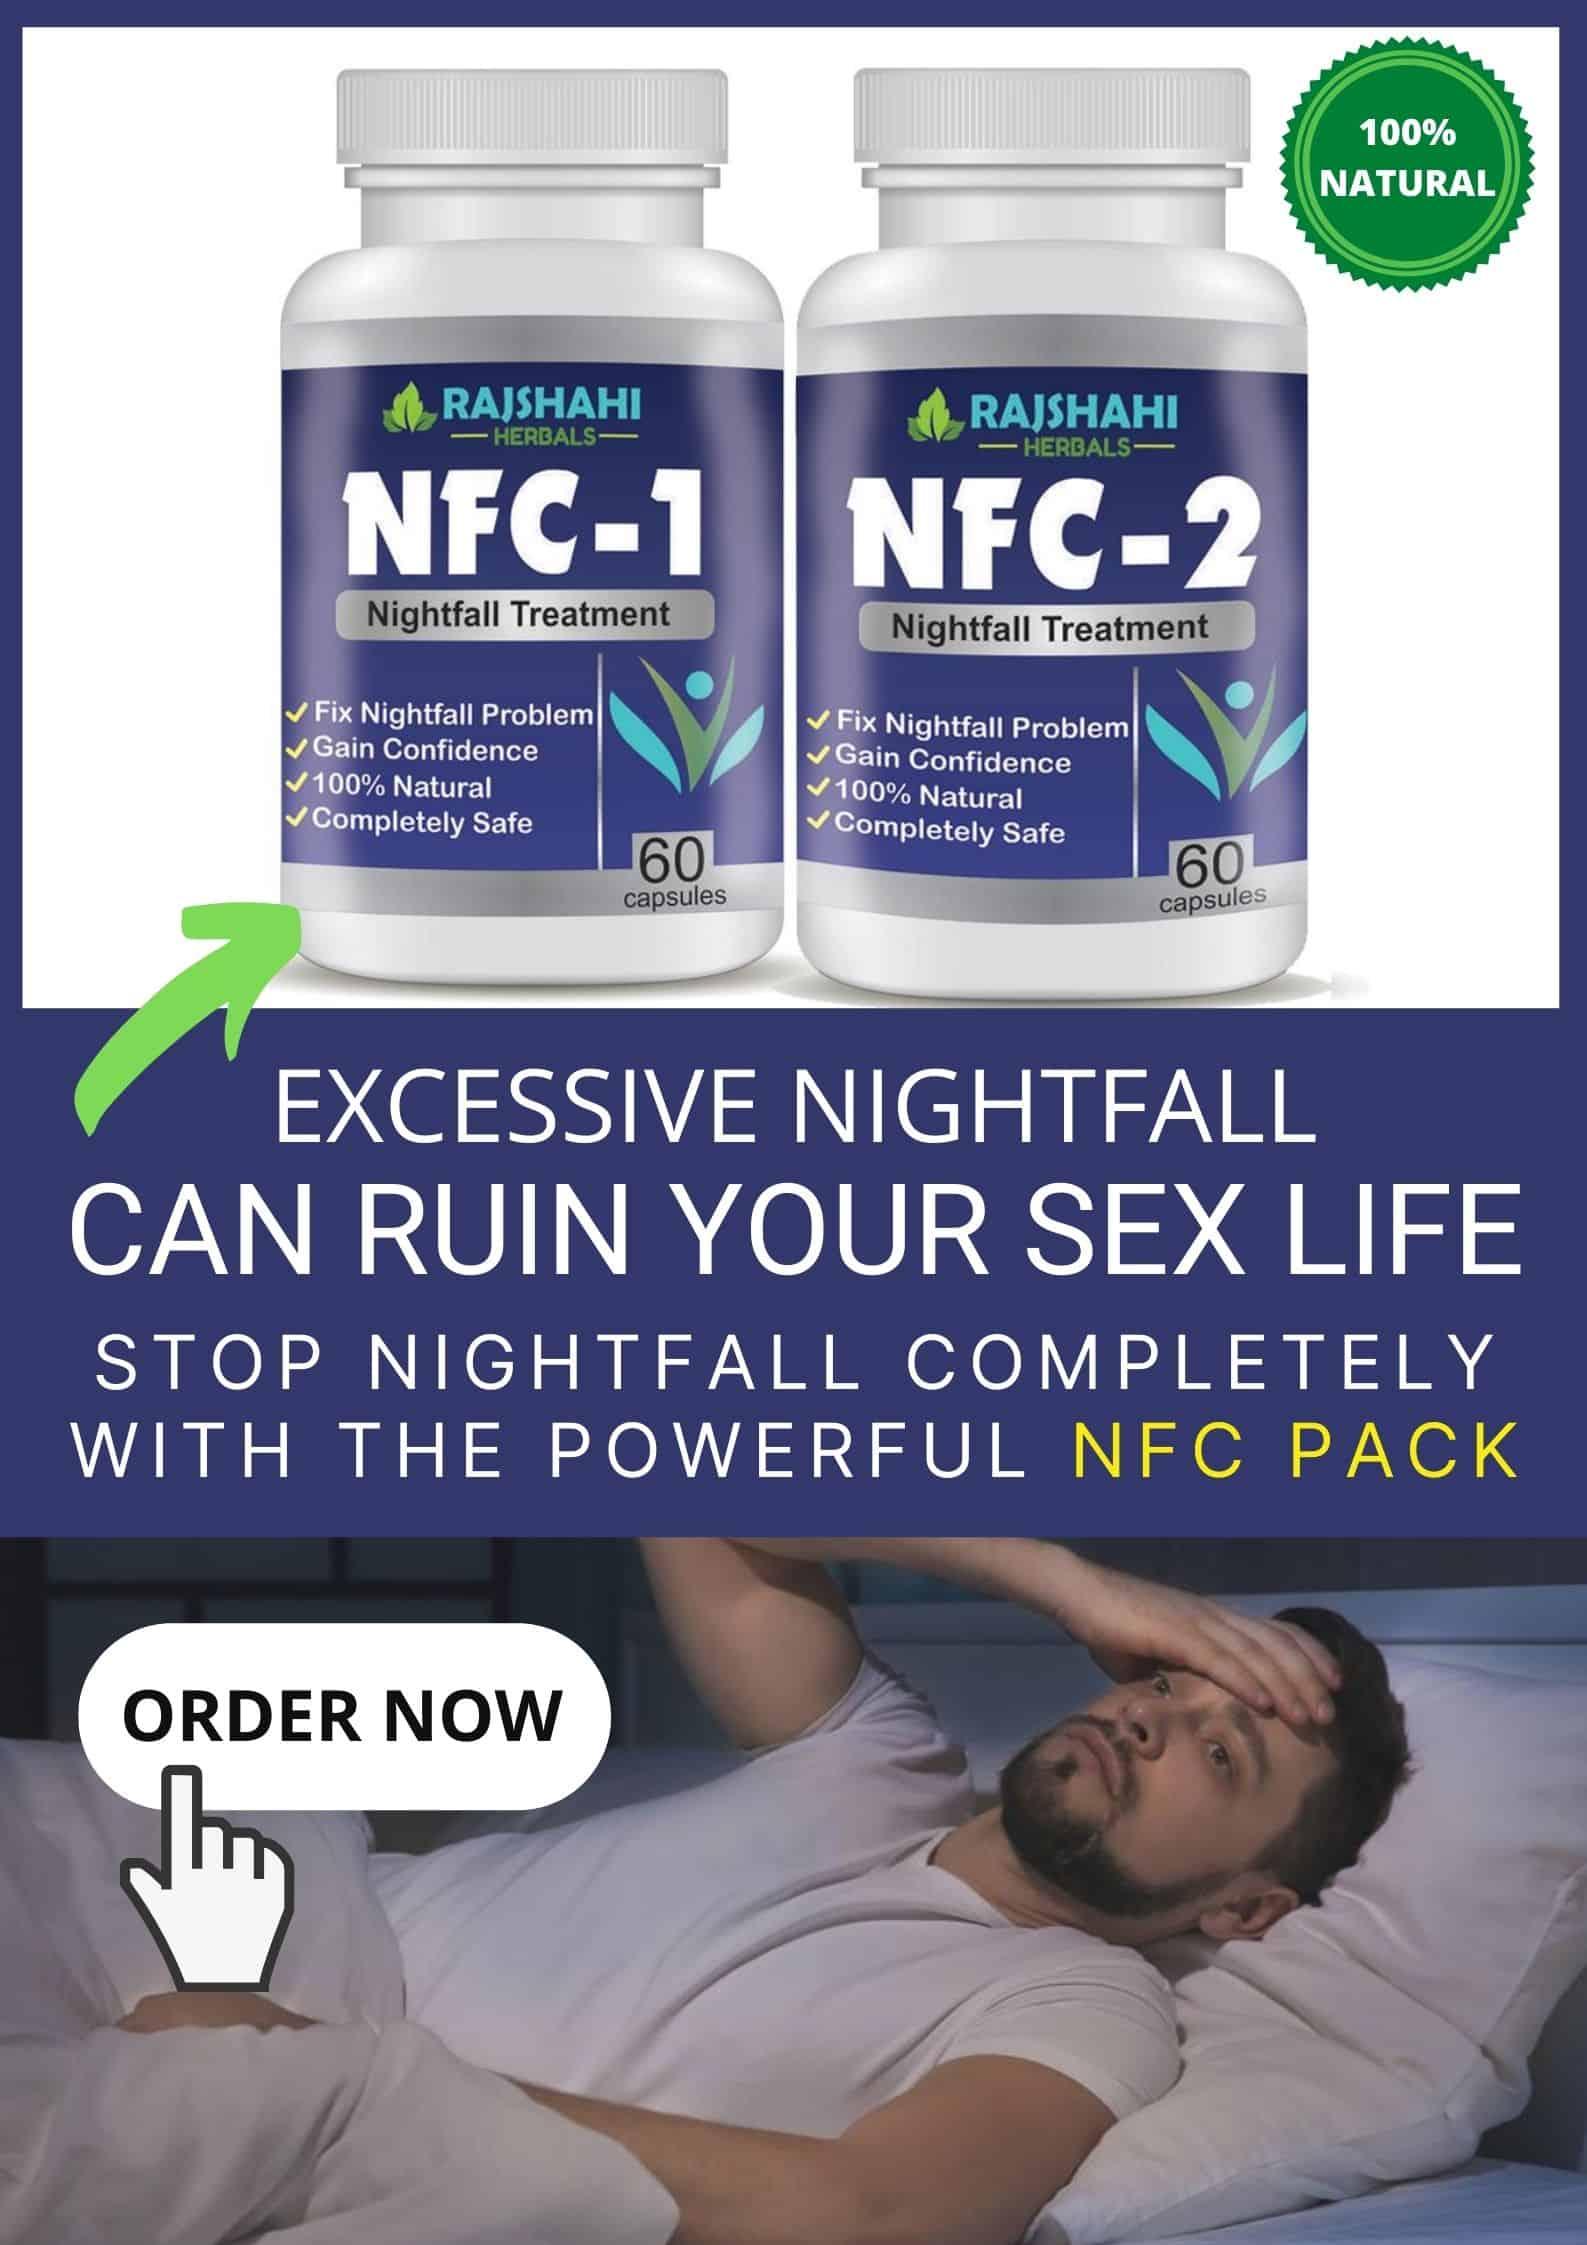 HOW TO STOP NIGHTFALL